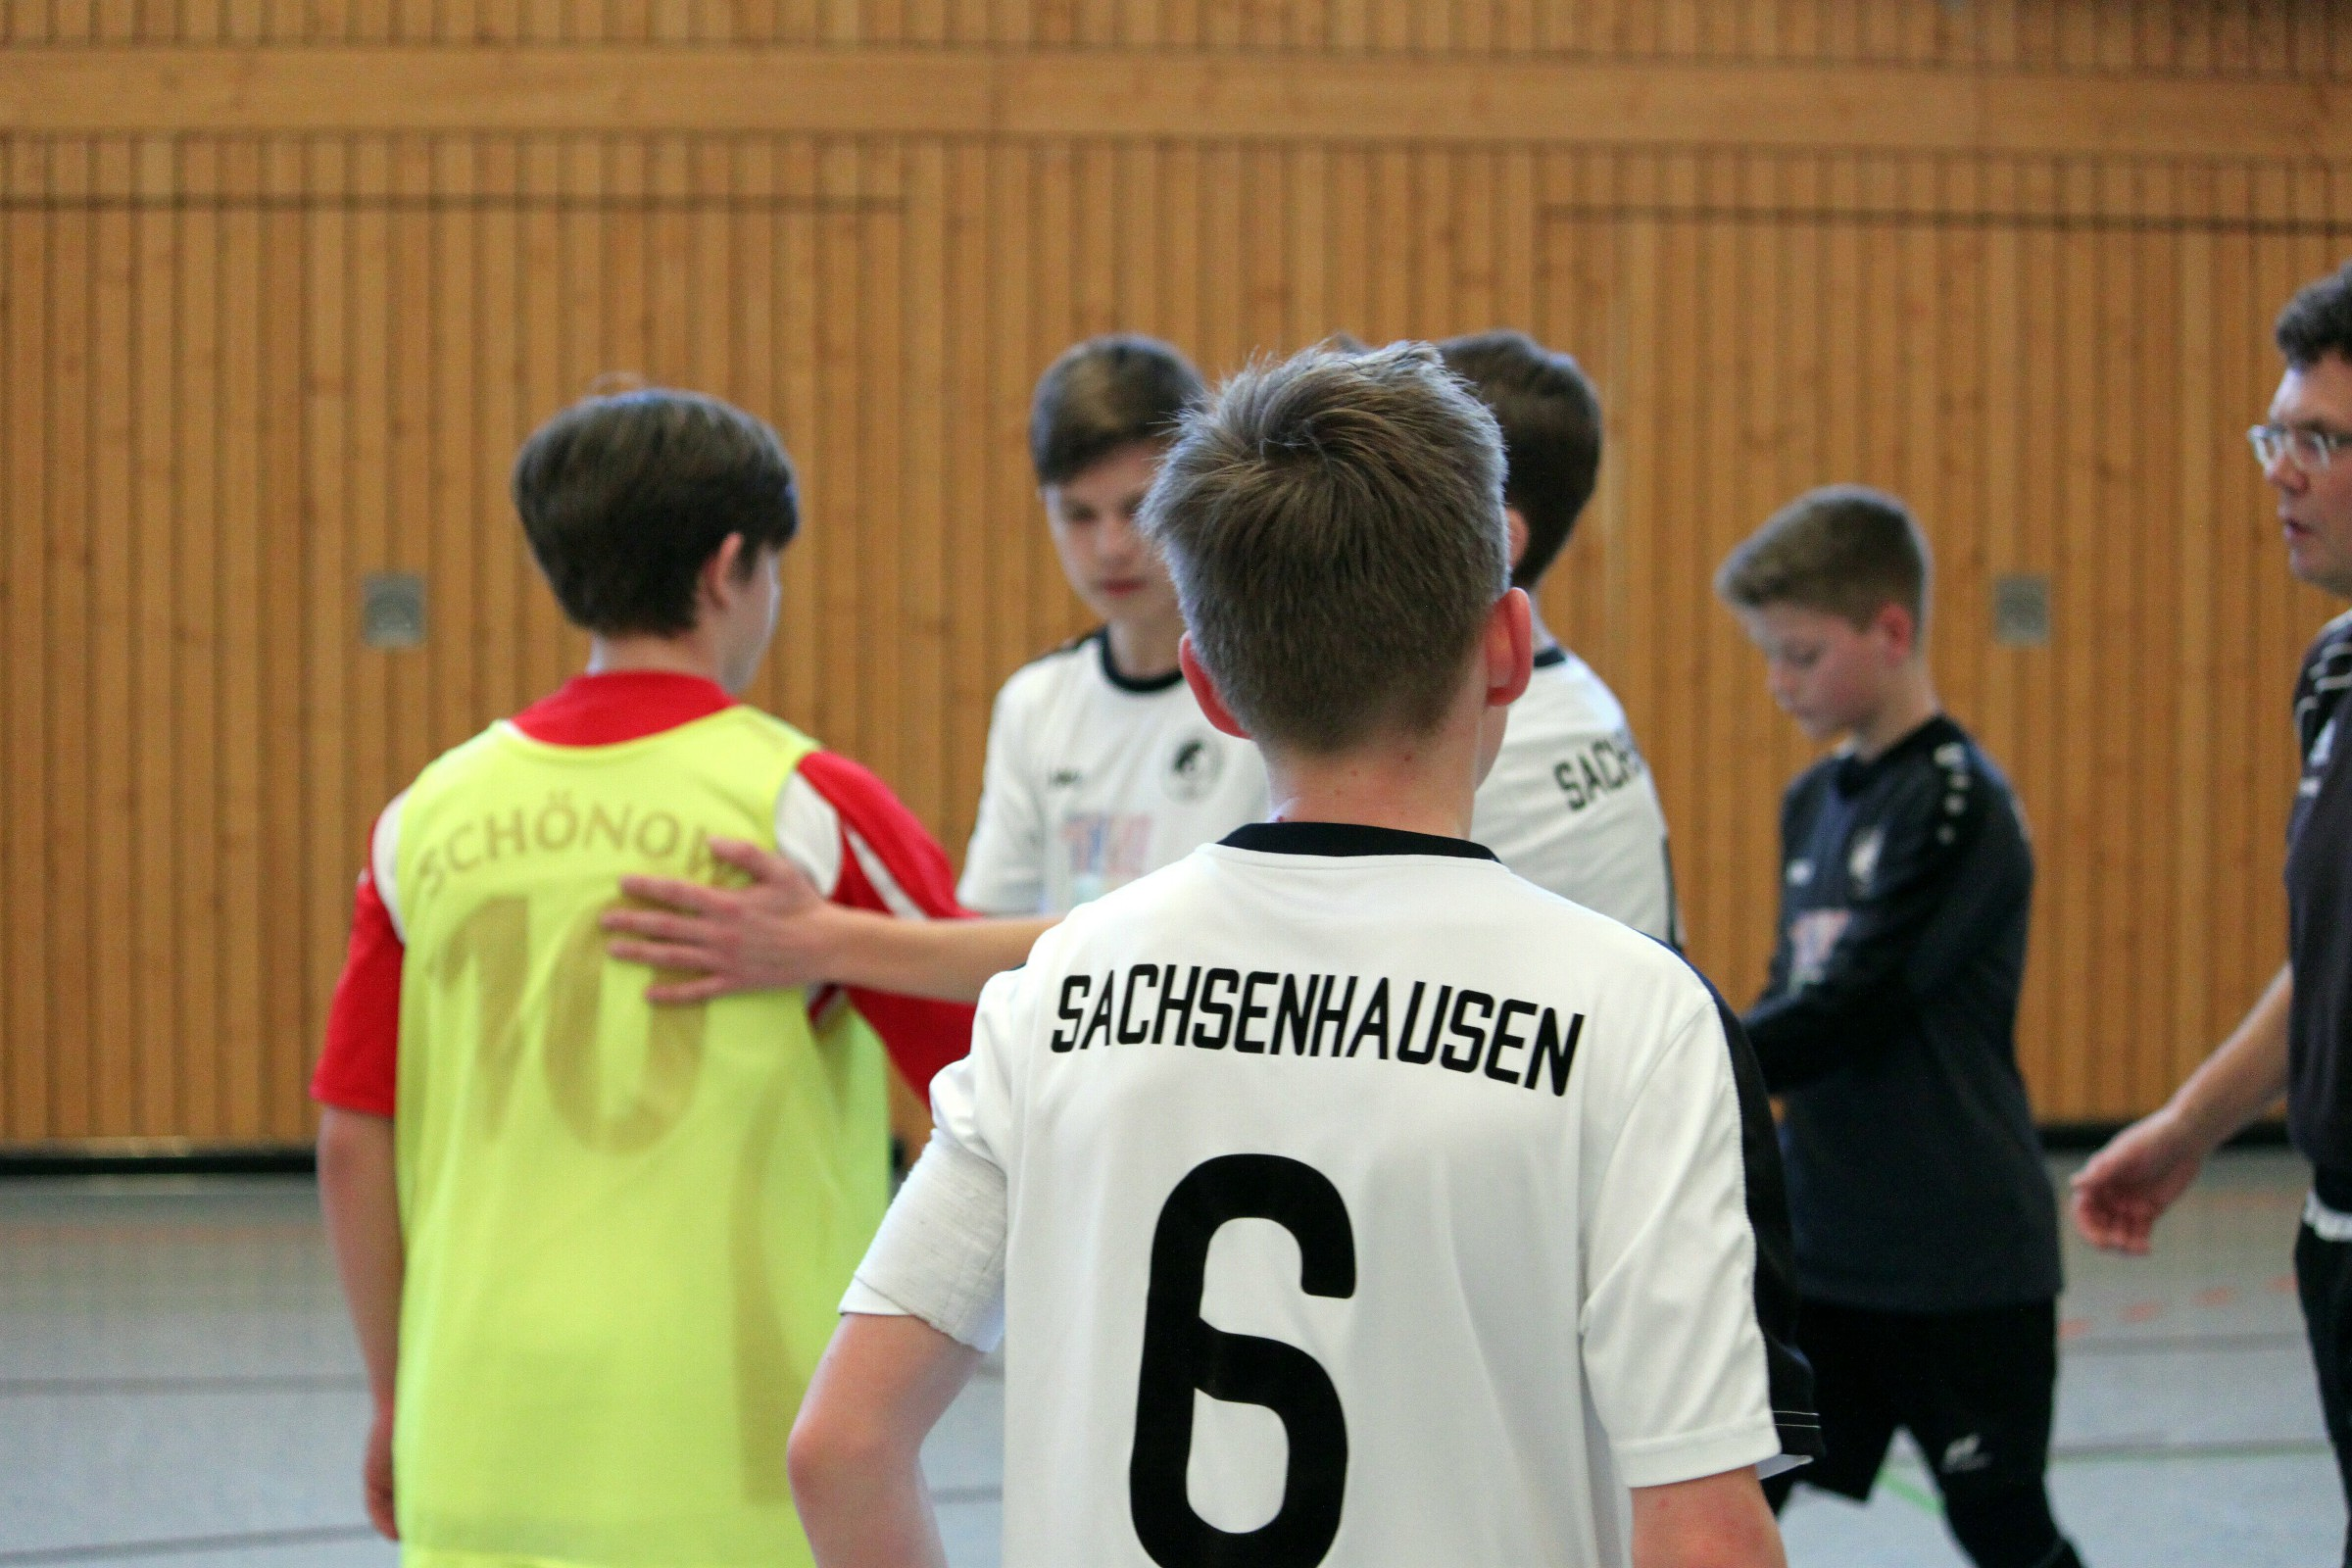 20190217 3. Wandlitzer Hallen-Cup der C-Junioren  (7)